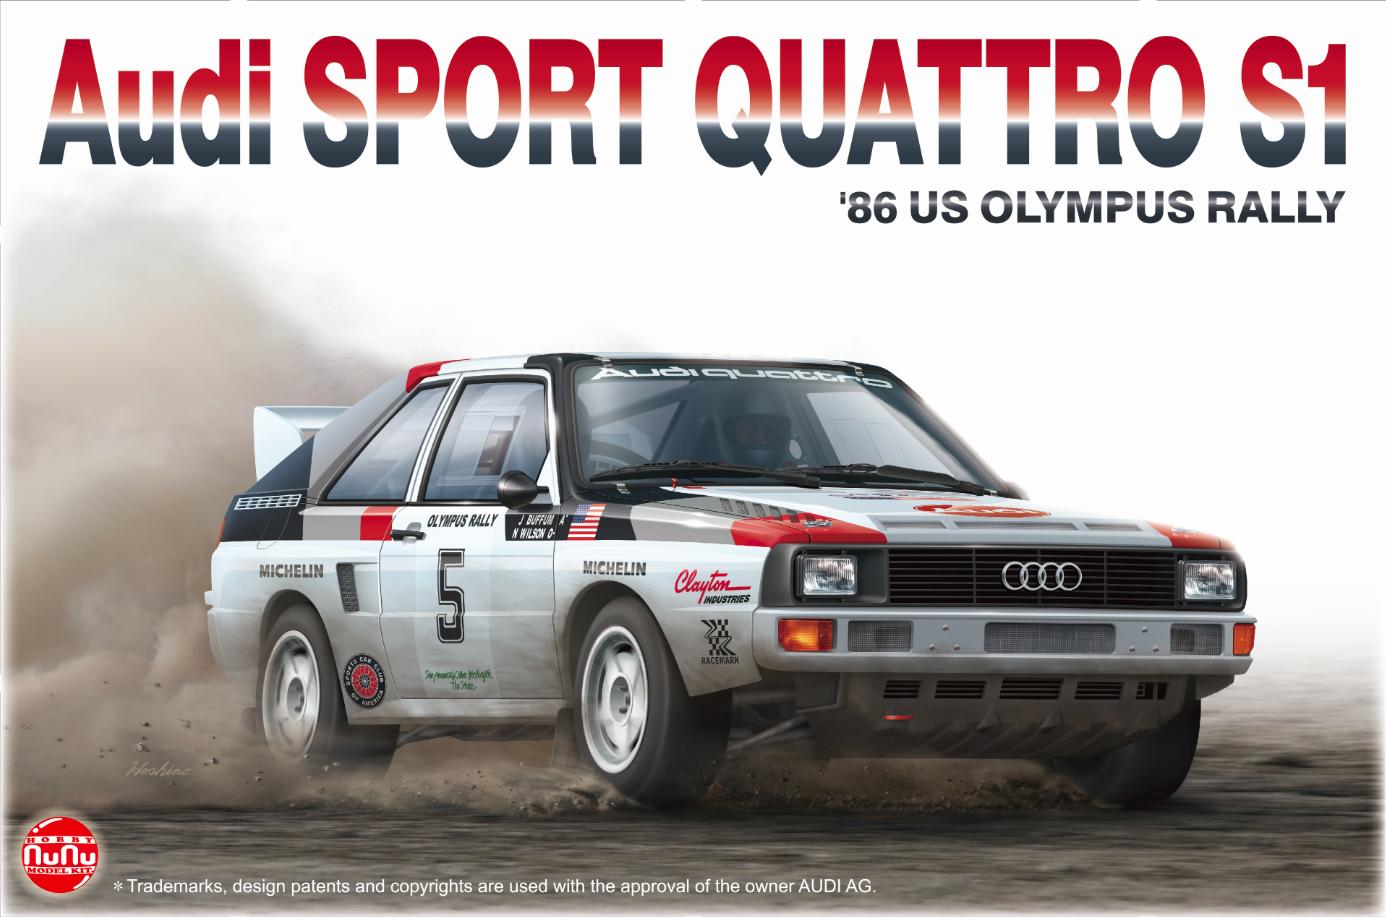 Platz NuNu 1/24 Audi Sports Quattro S1 1986 US Olympus Rally